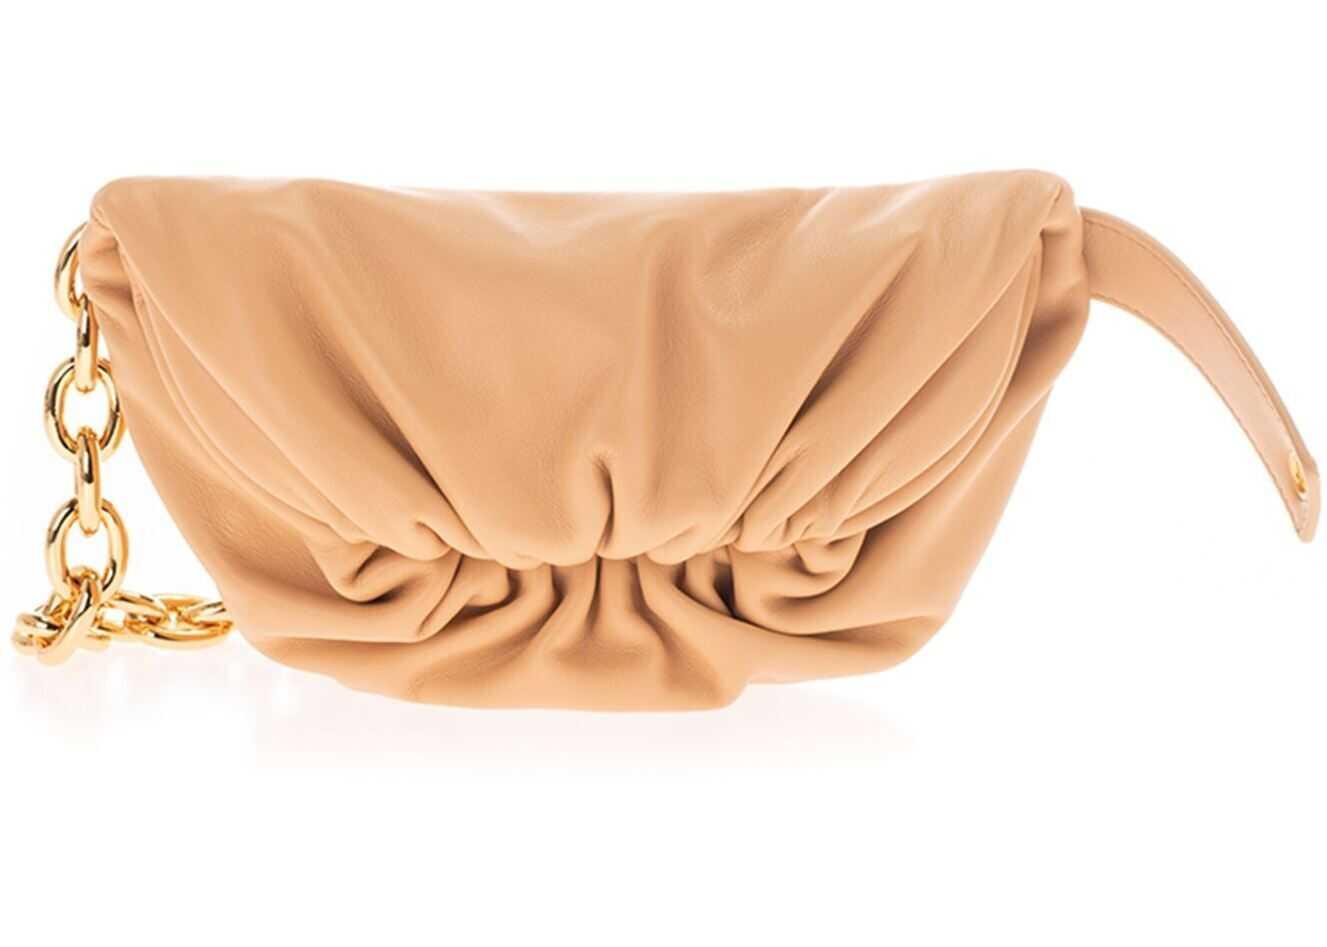 Bottega Veneta The Pouch Mini Leather Belt Bag In Beige 651445VCP412700 Beige imagine b-mall.ro